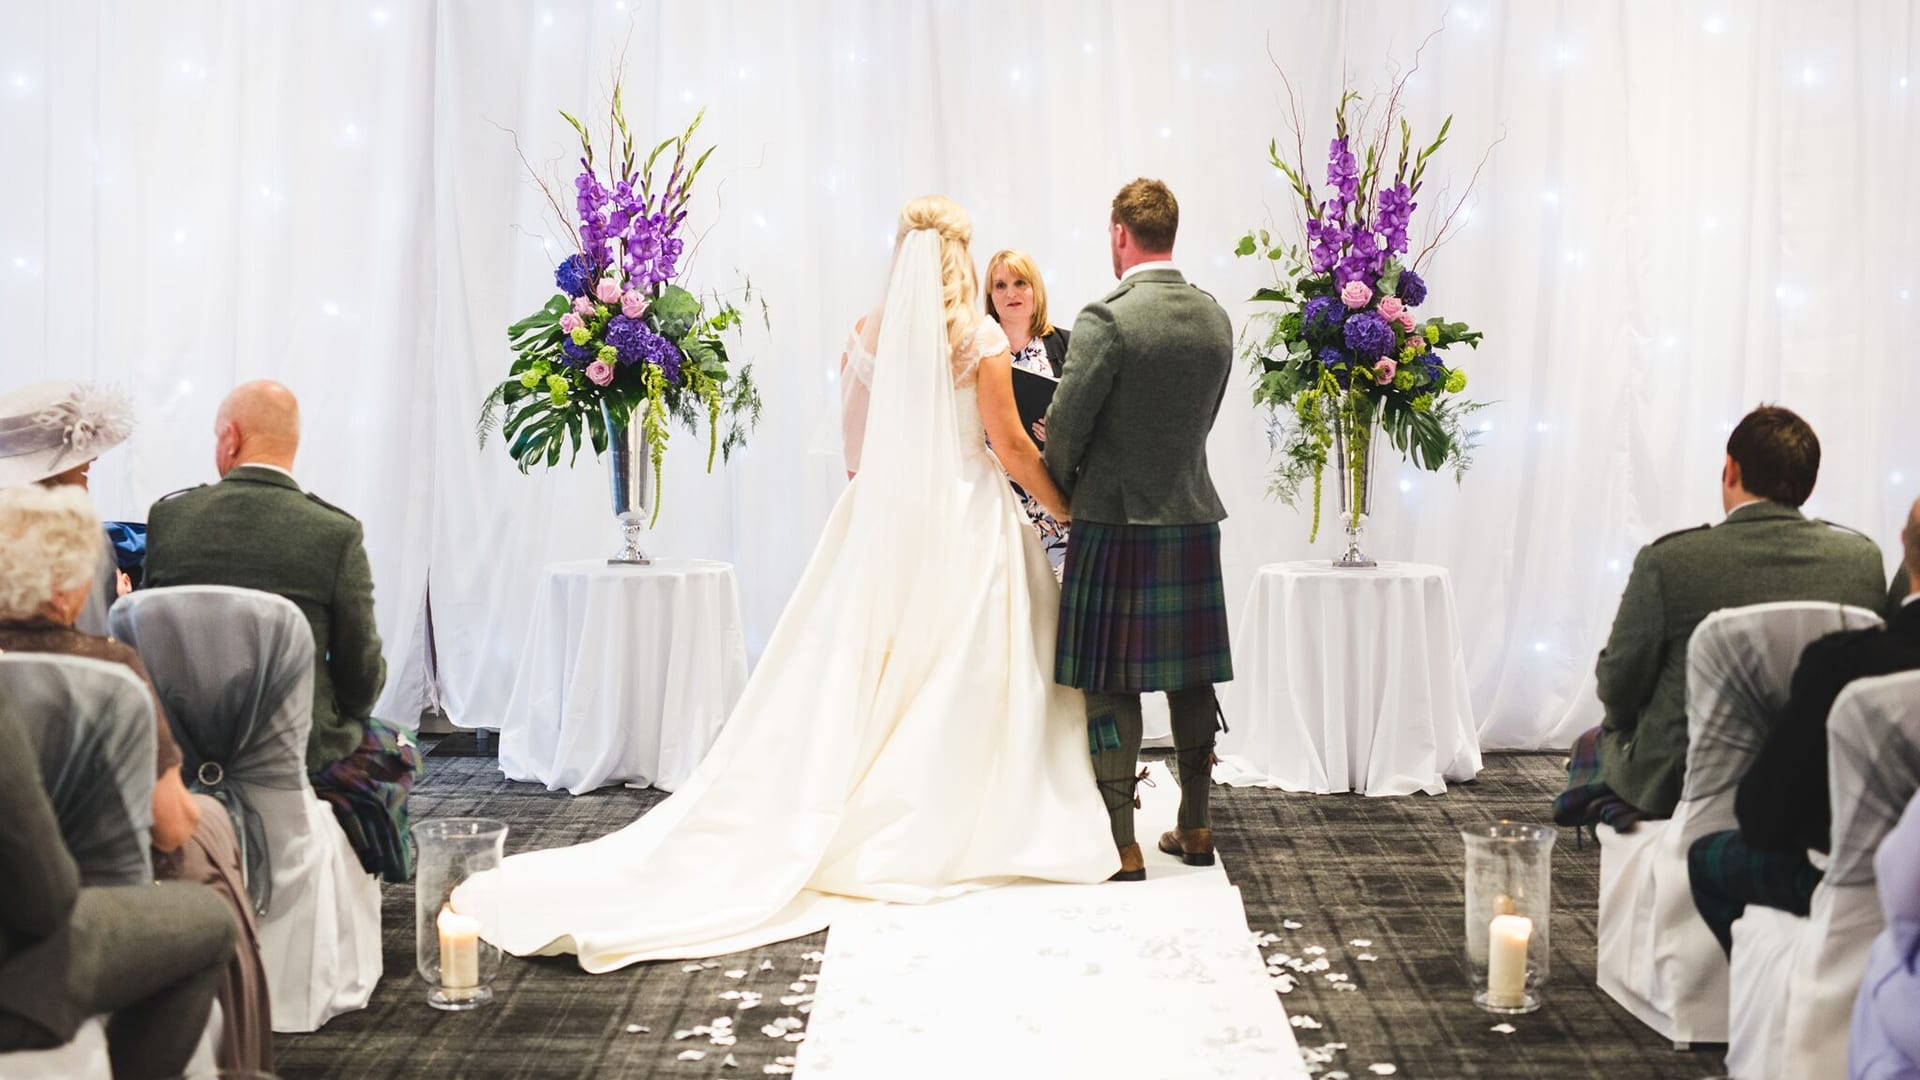 Wedding ceremony at Barony Castle